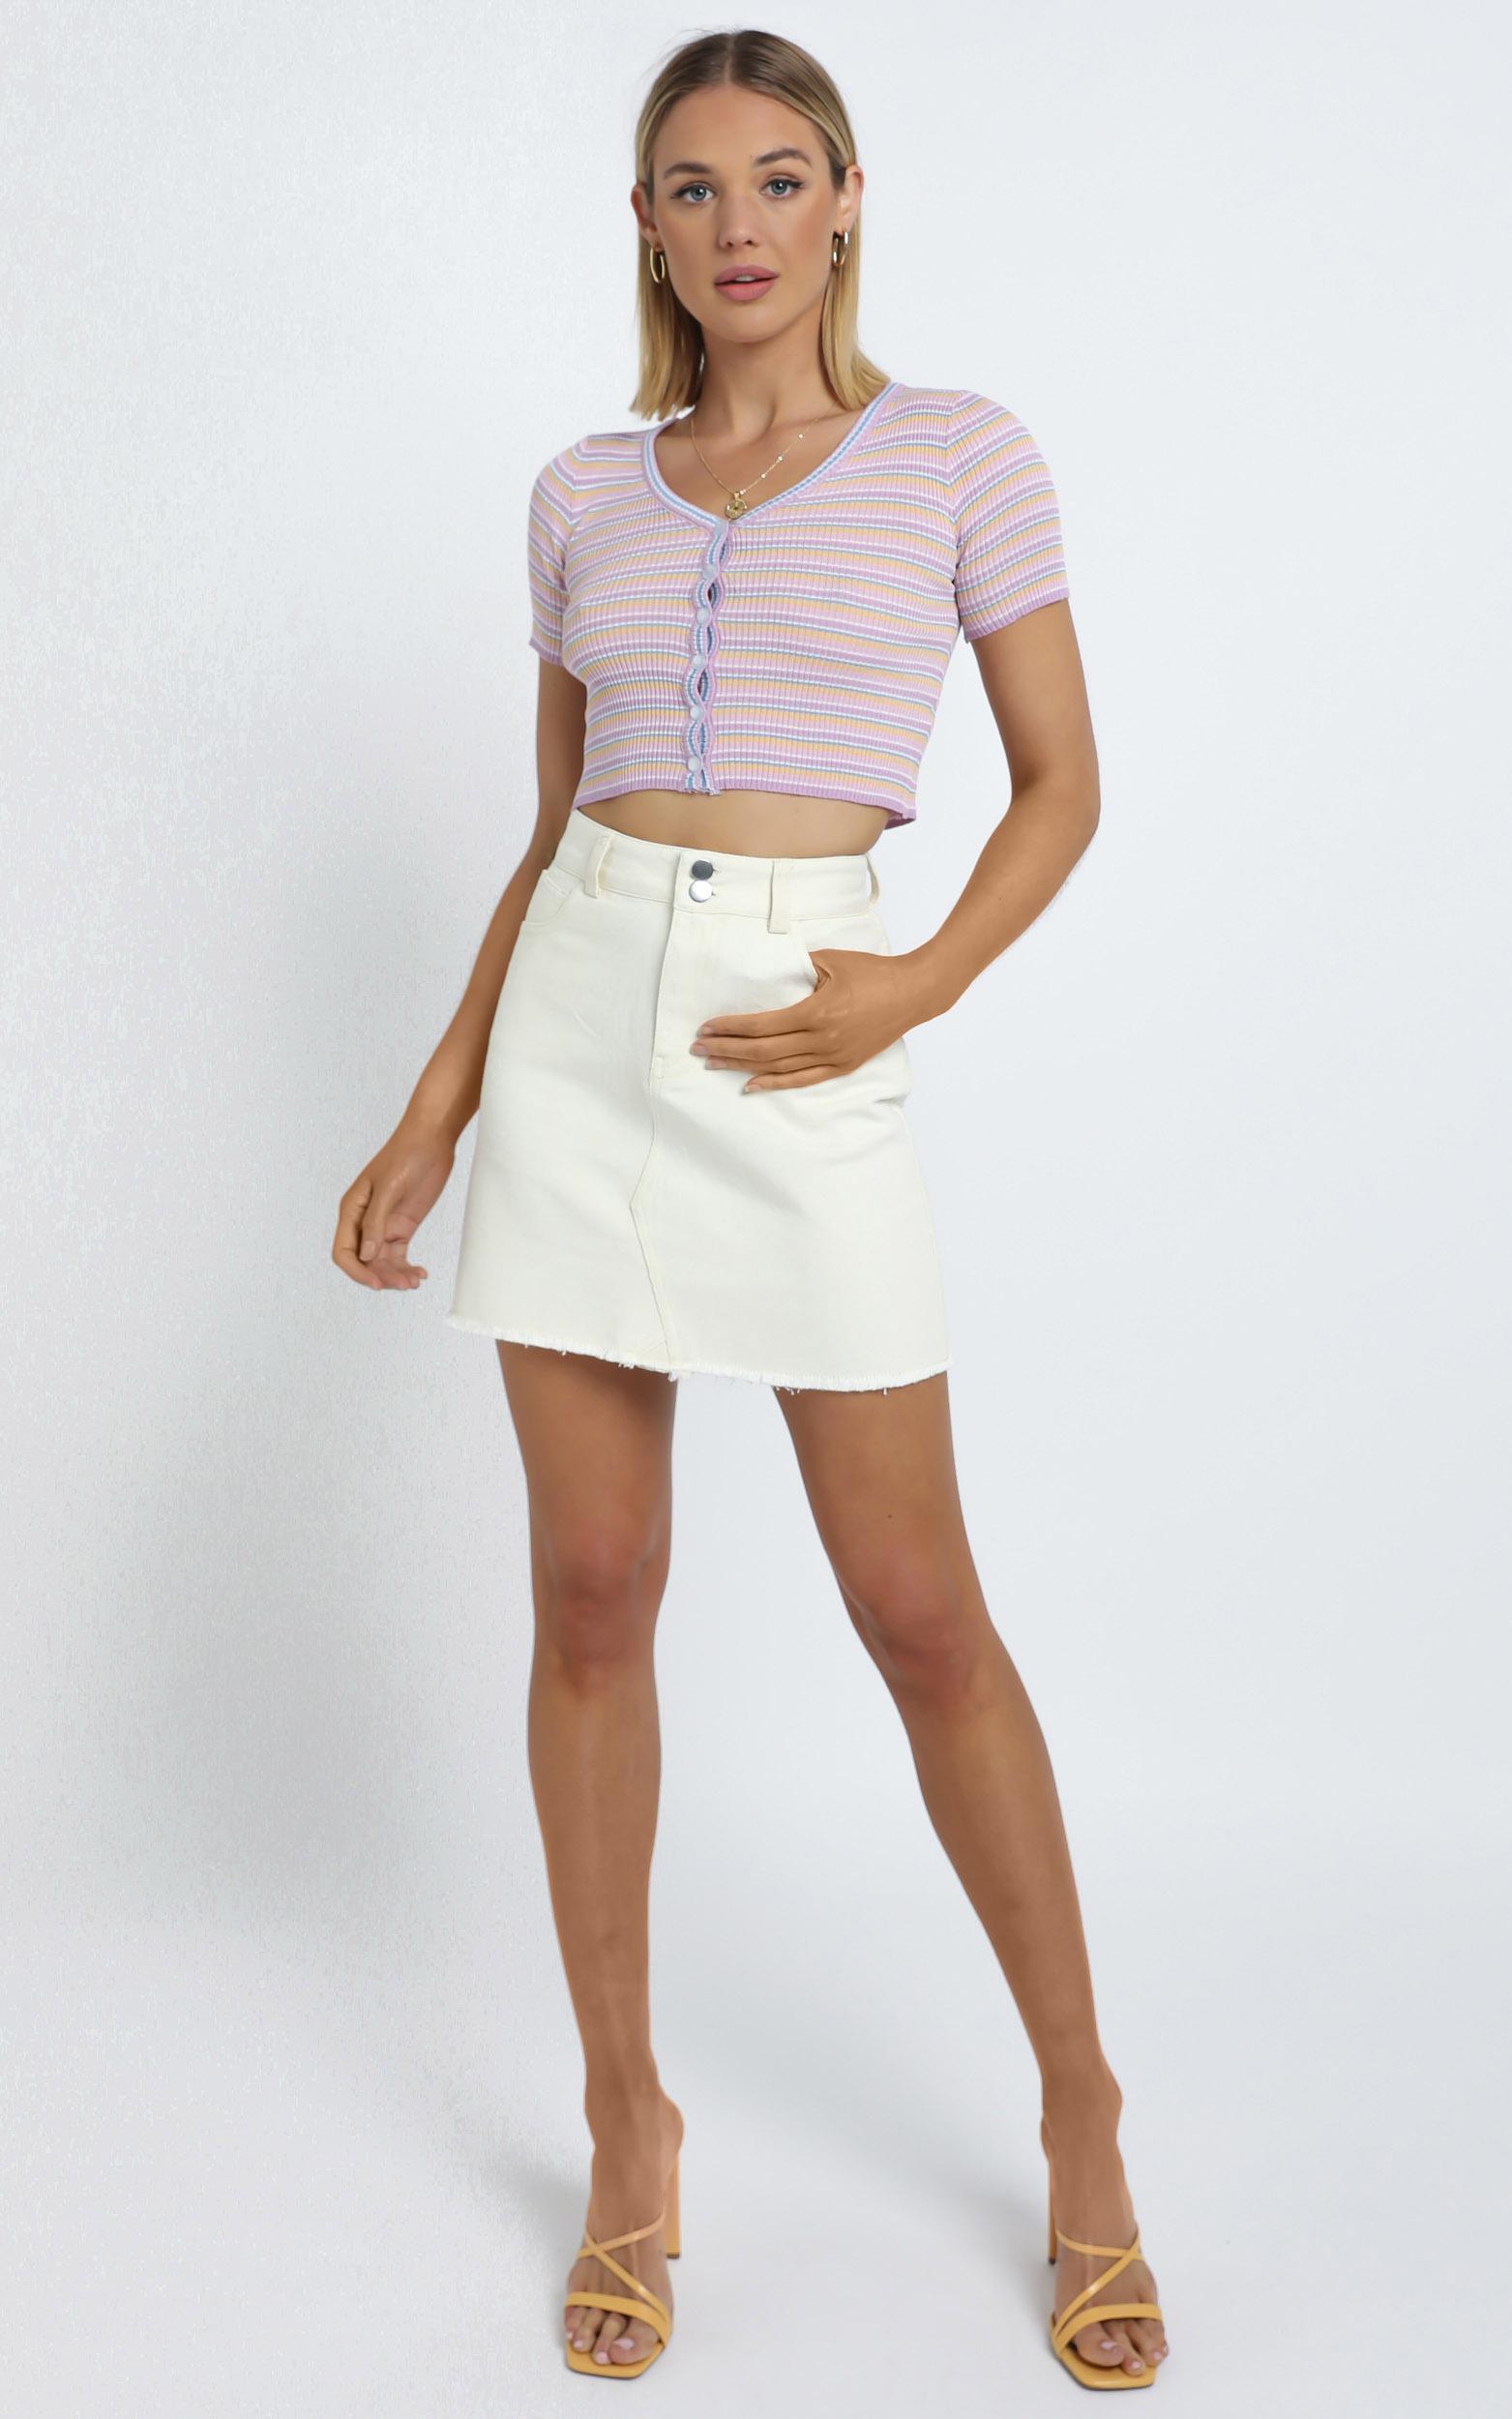 Hilary Denim Skirt in Beige - 14 (XL), CRE1, hi-res image number null